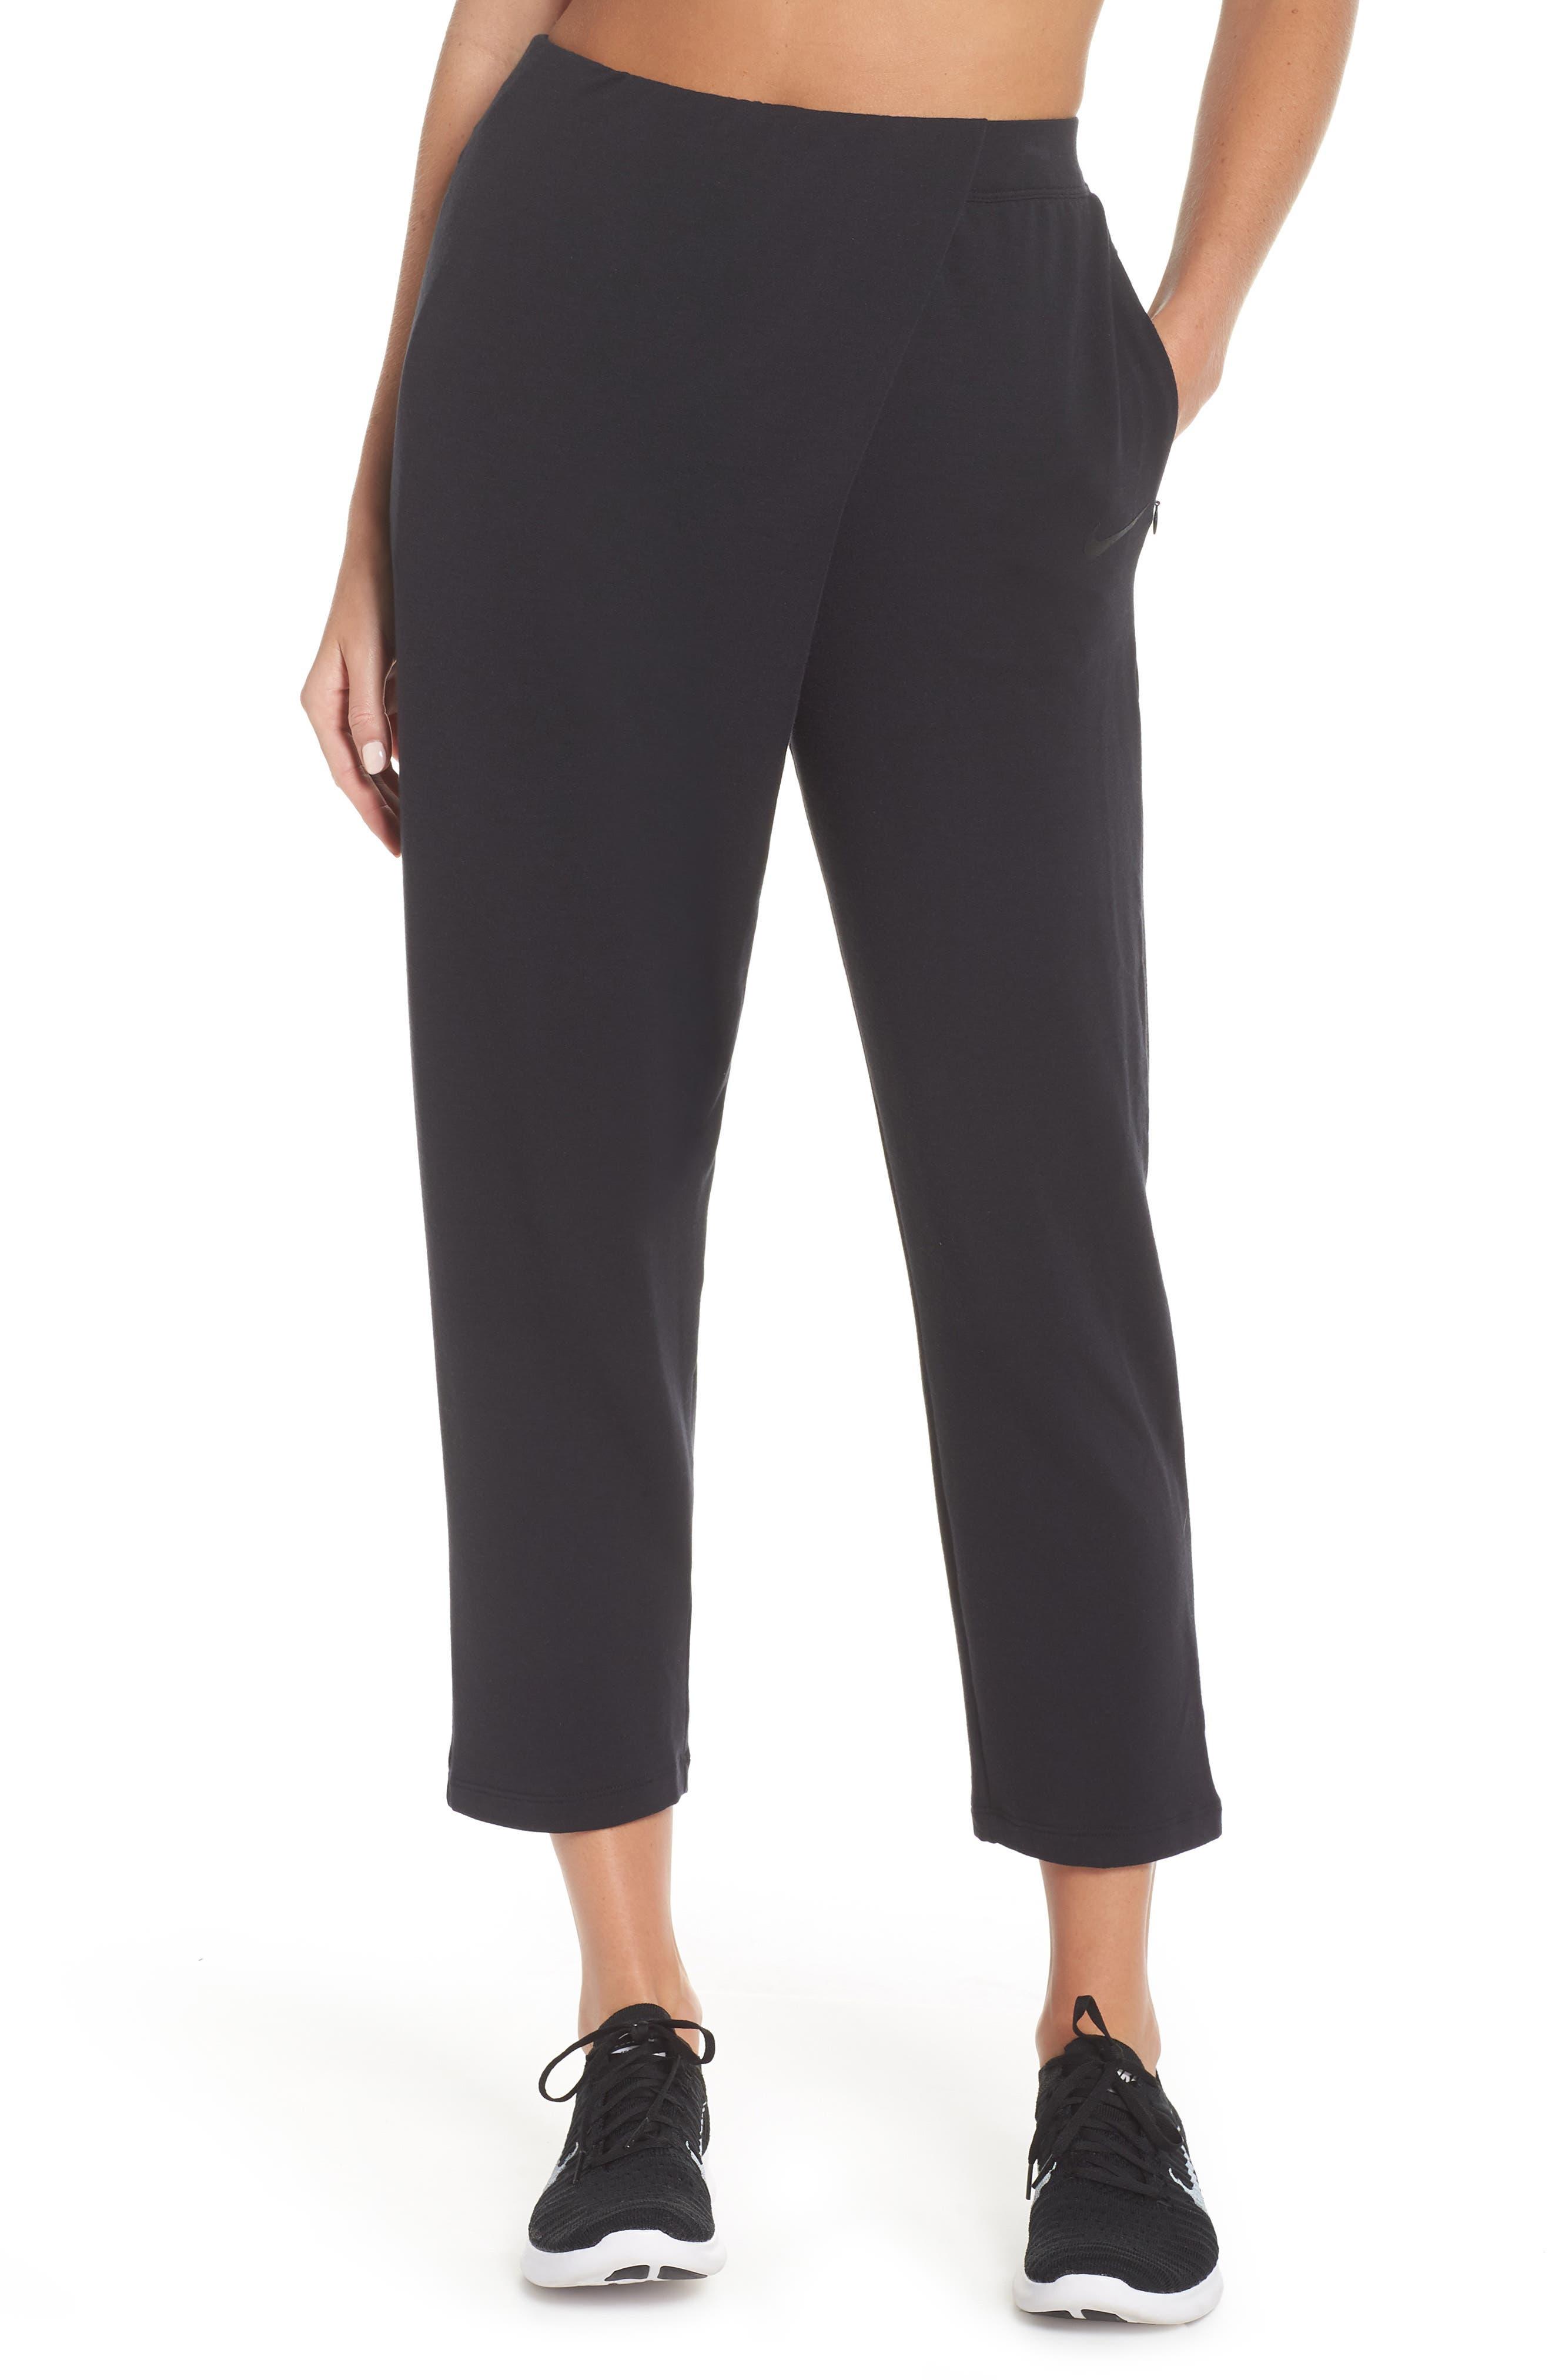 NIKE Dry Studio Training Pants, Main, color, BLACK/ BLACK